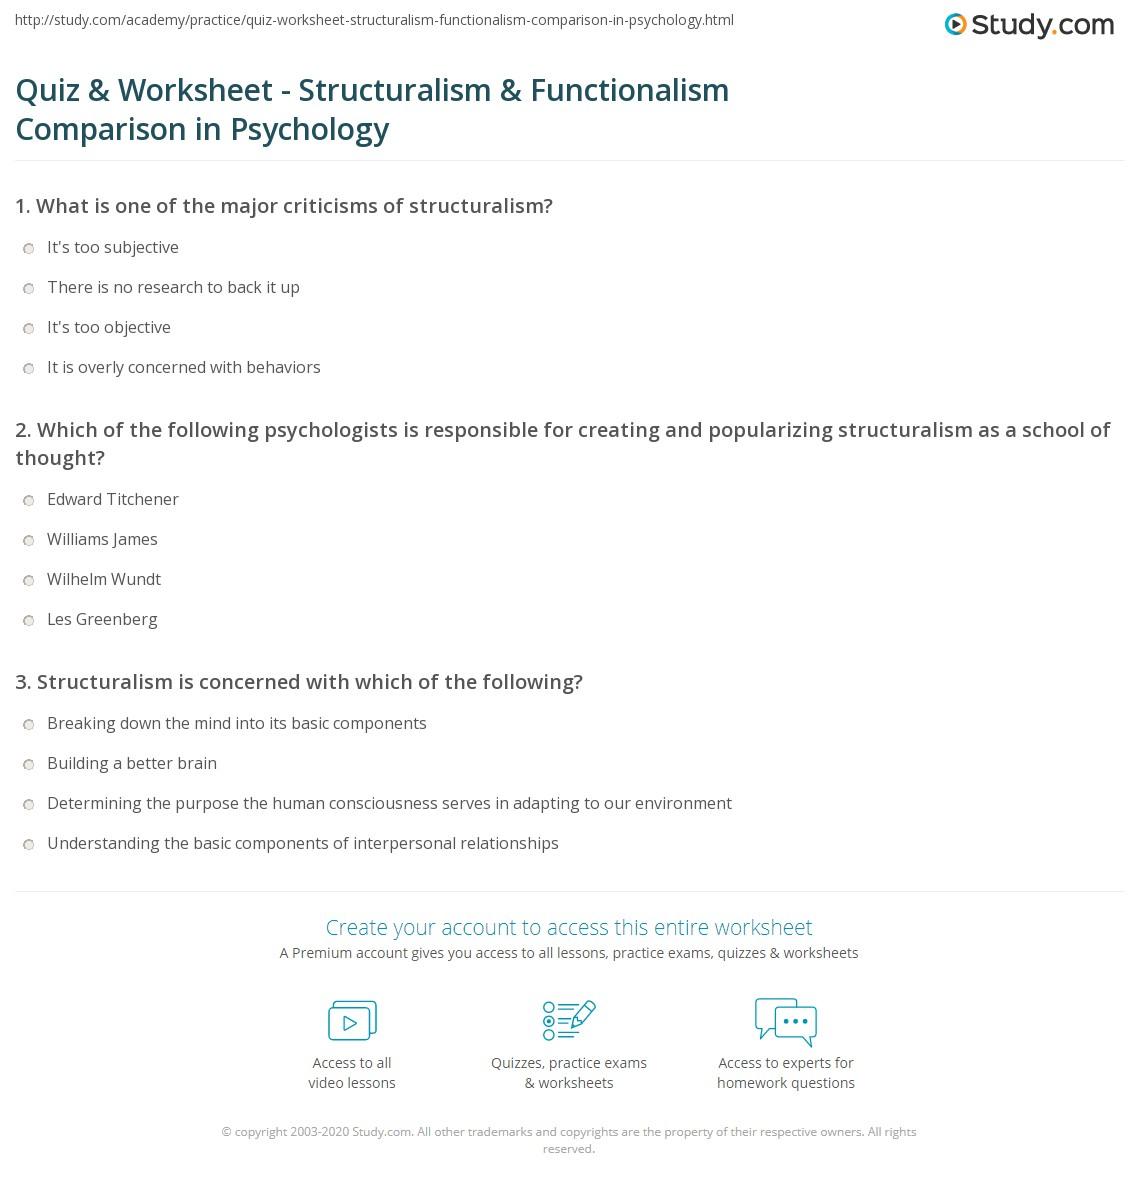 Workbooks psychology worksheets : Quiz & Worksheet - Structuralism & Functionalism Comparison in ...